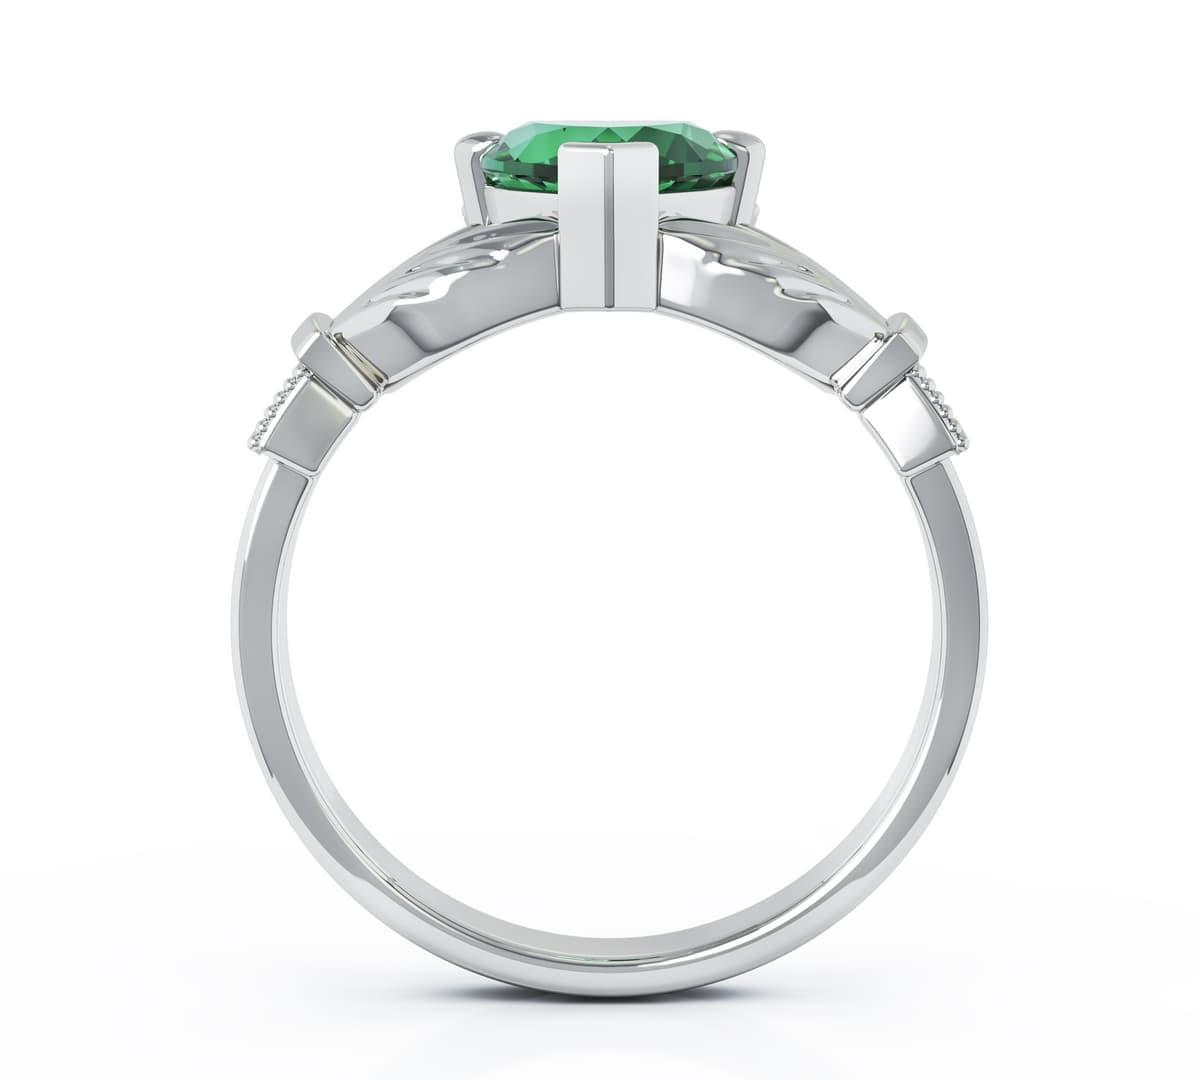 Heartshape Emerald Diamond Claddagh Engagement Ring